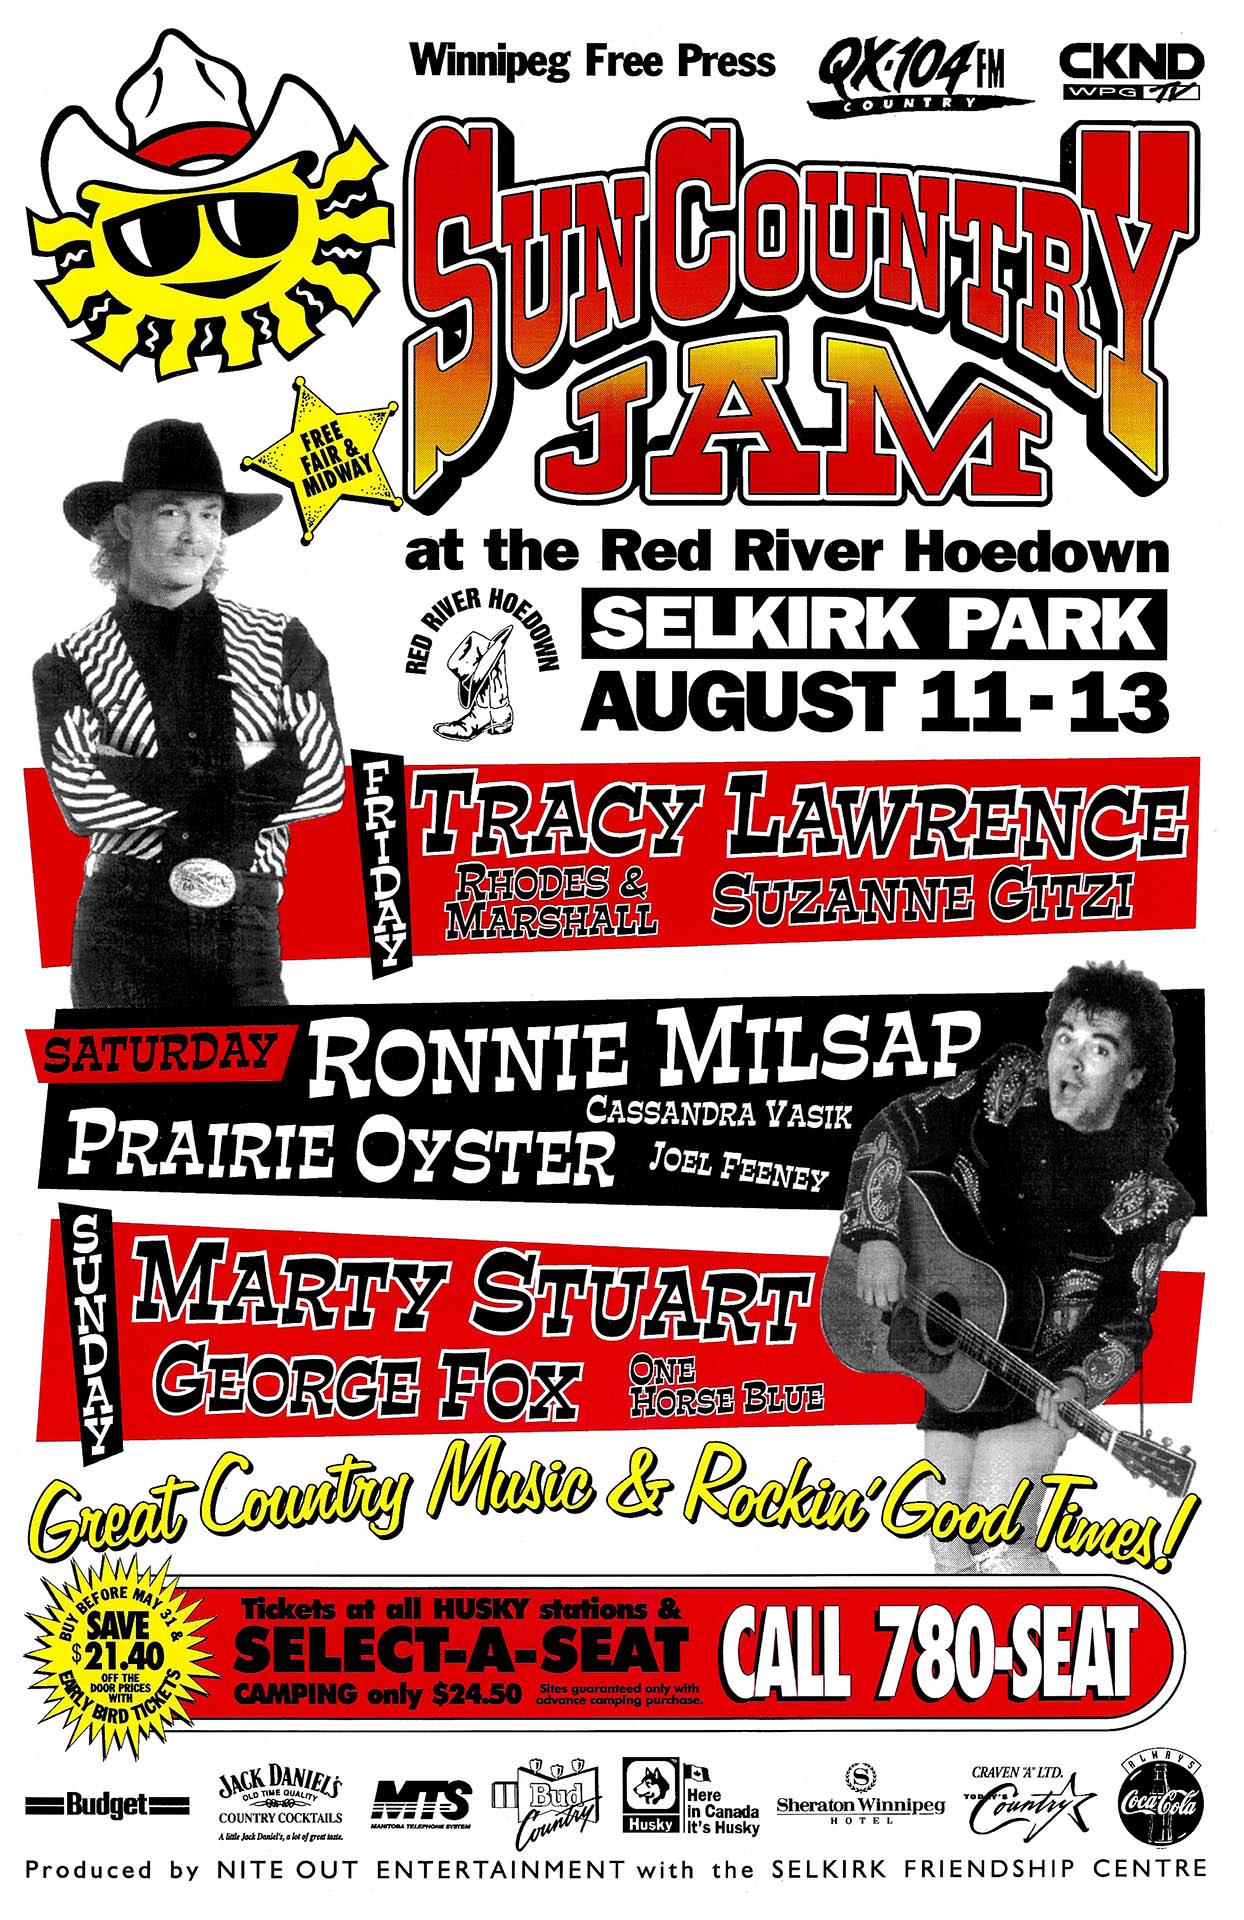 Sun Country Jam – 1995